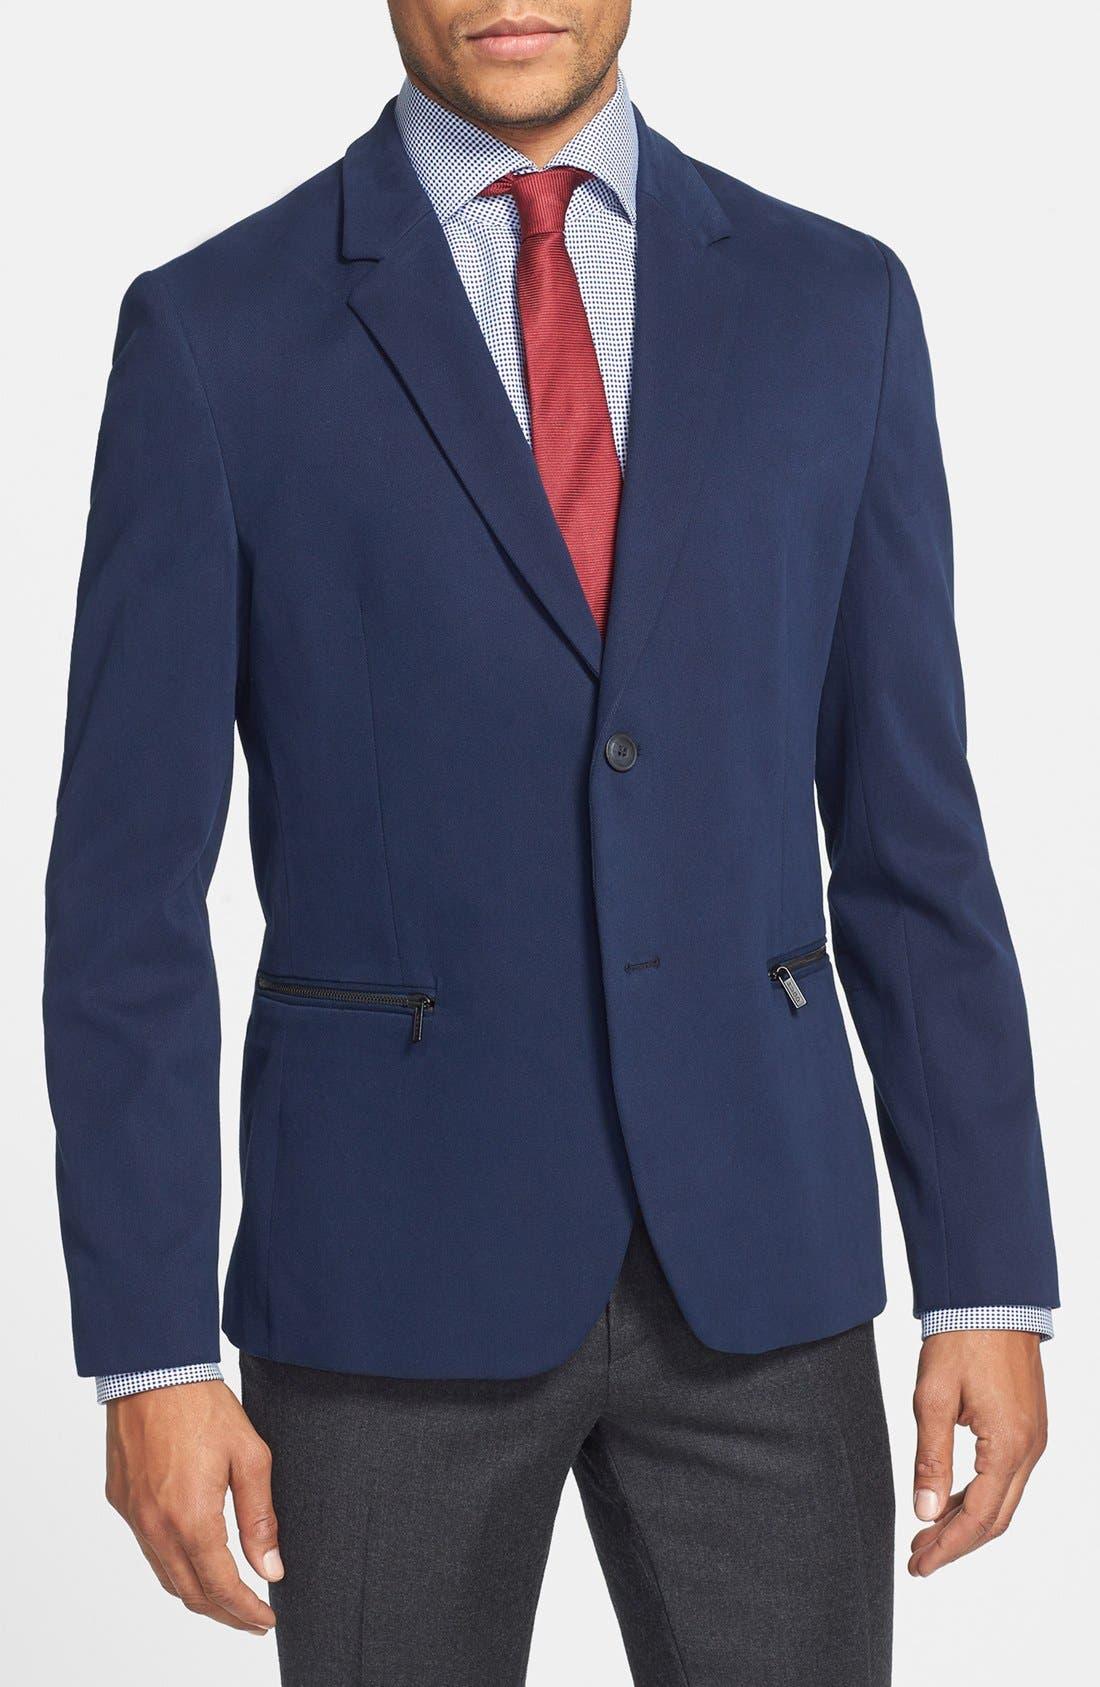 Main Image - HUGO 'Alston' Sportcoat